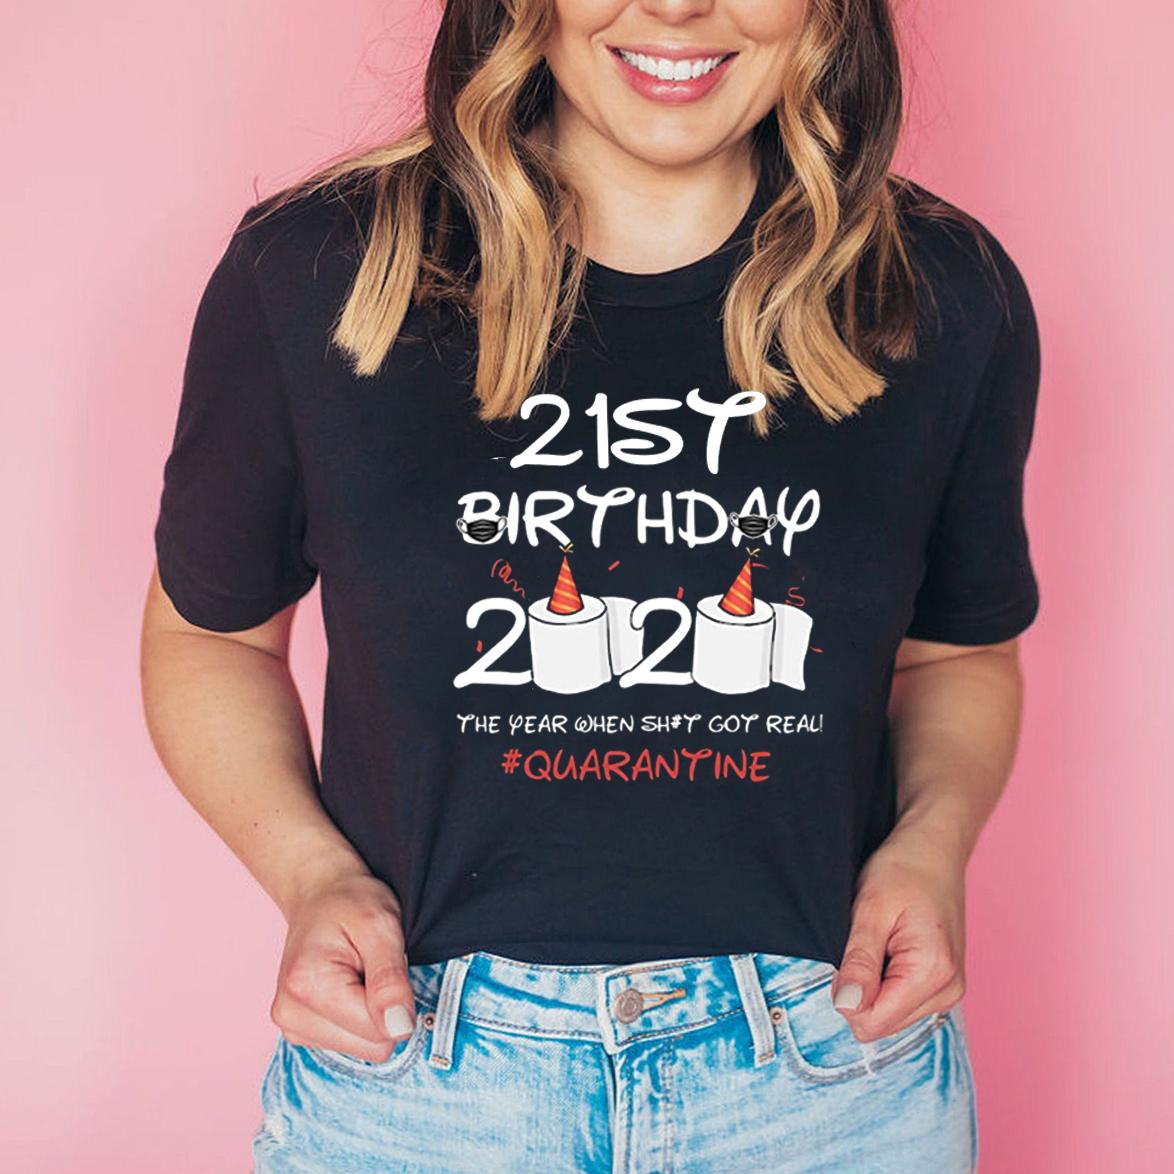 21st Birthday 2020 #Quarantine Shirt - Social Distancing Birthday T-Shirt